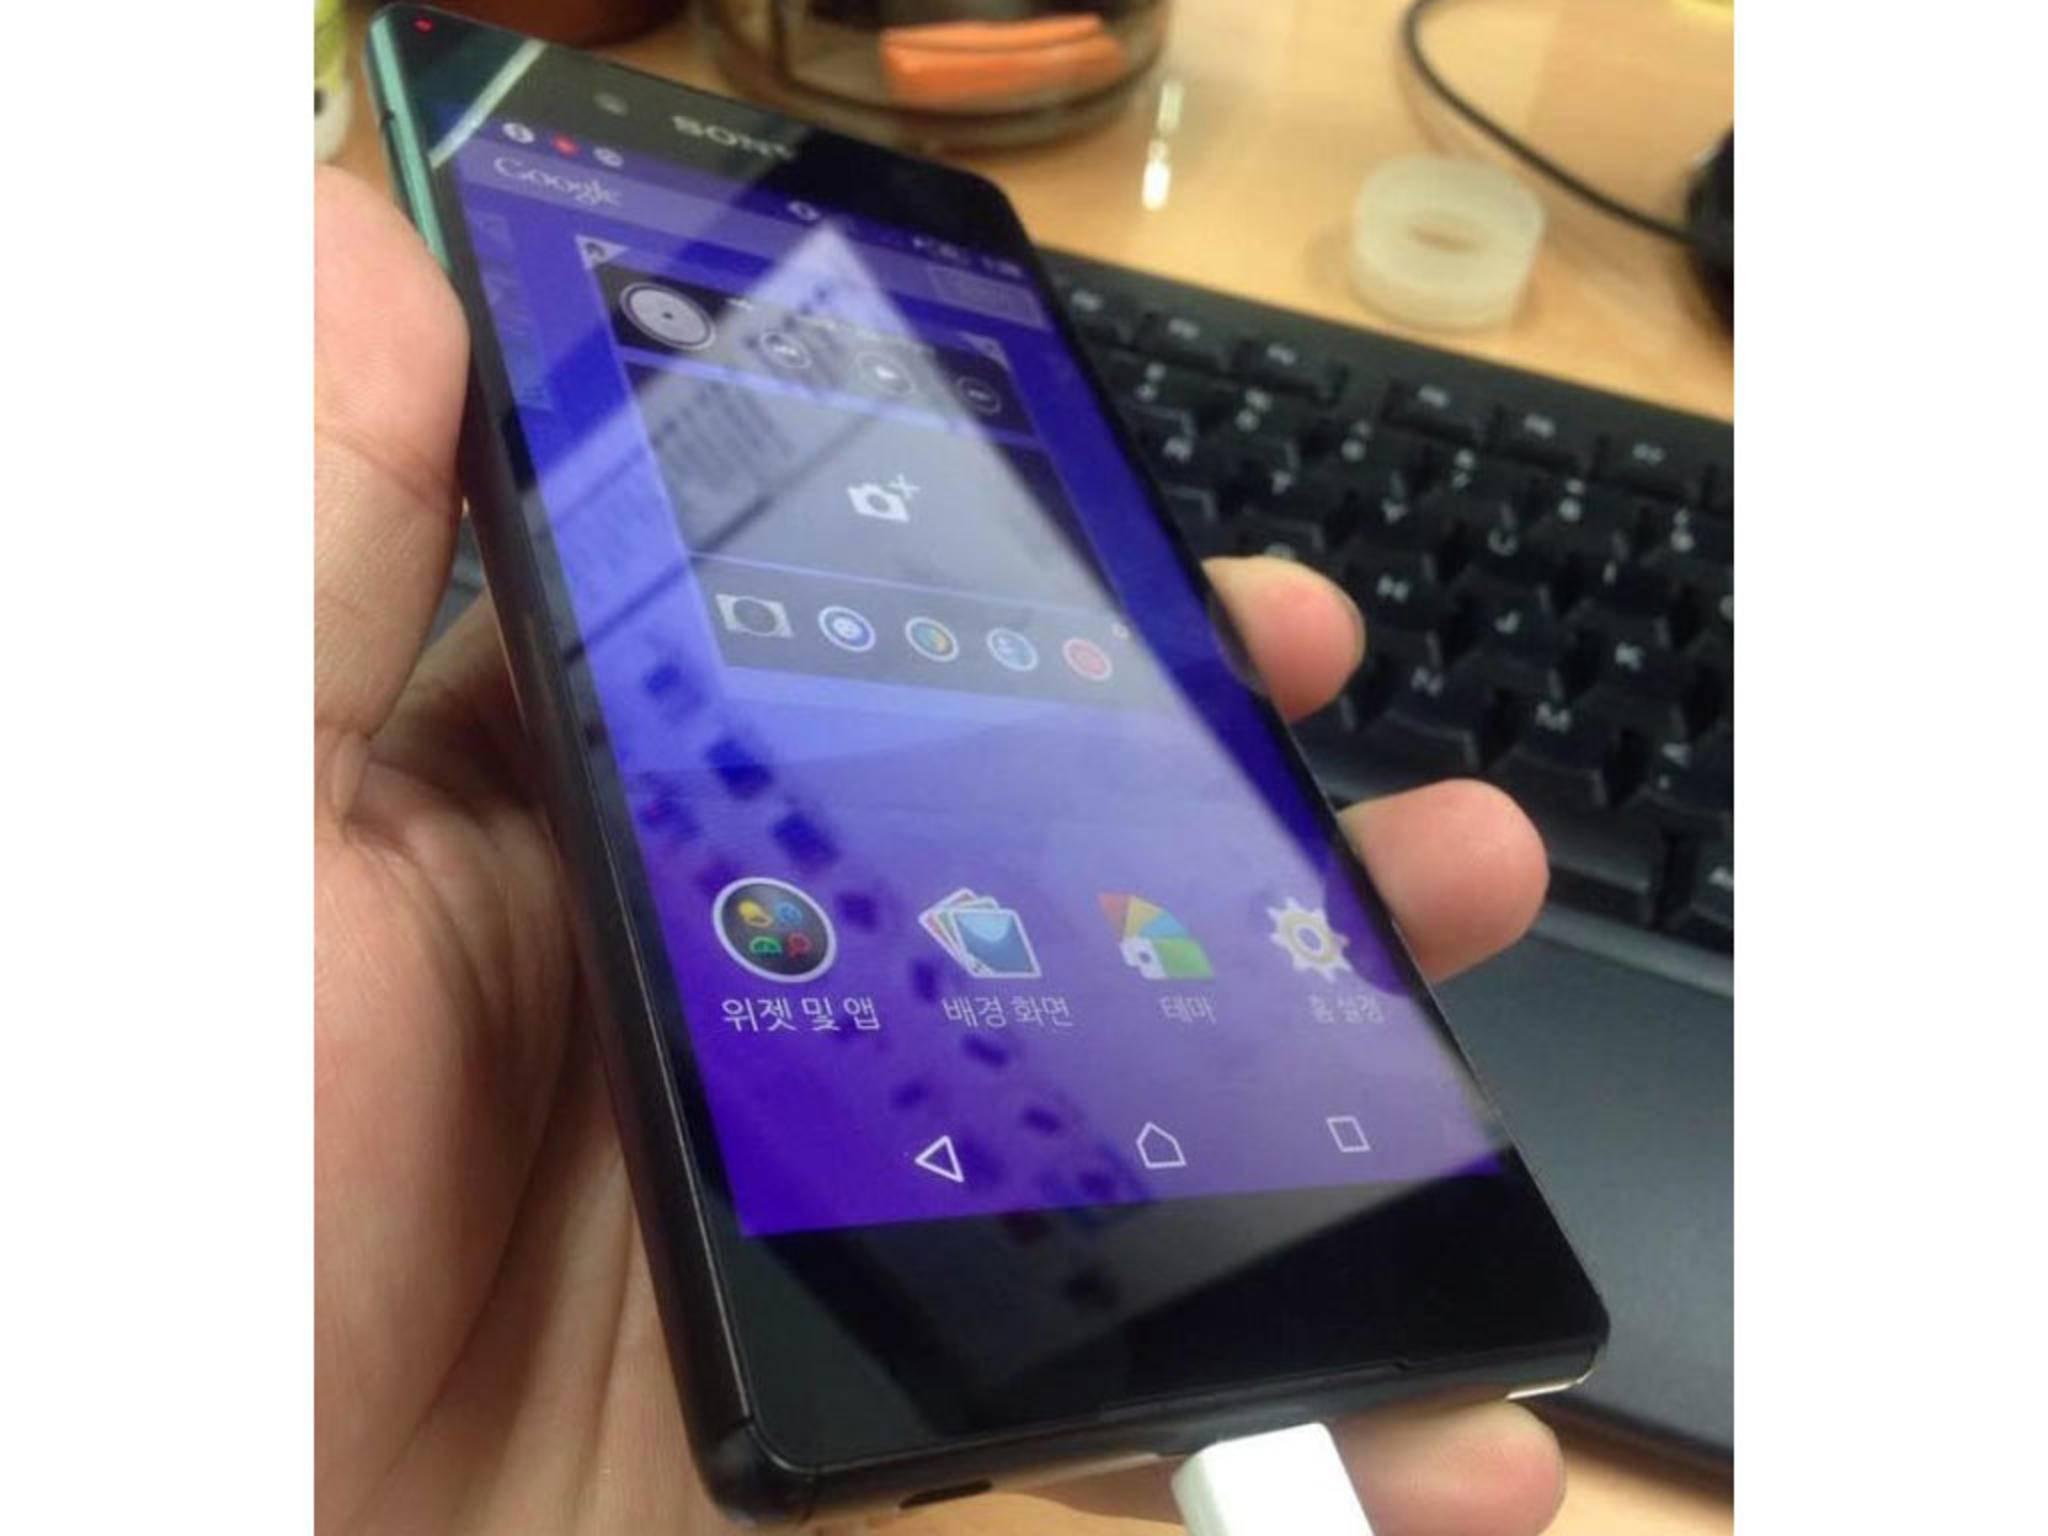 Das Sony Xperia Z4